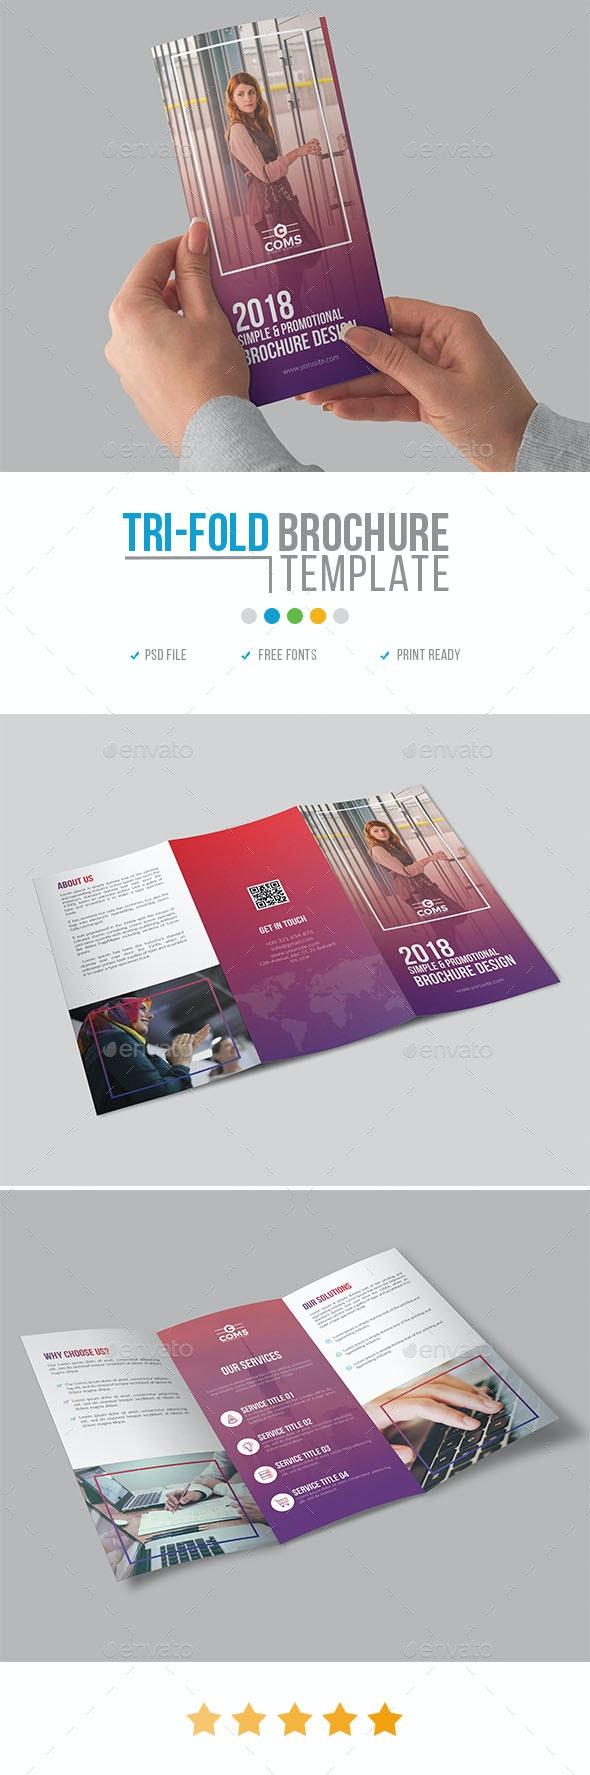 Corporate Trifold Brochure Template 26 - Corporate Brochures